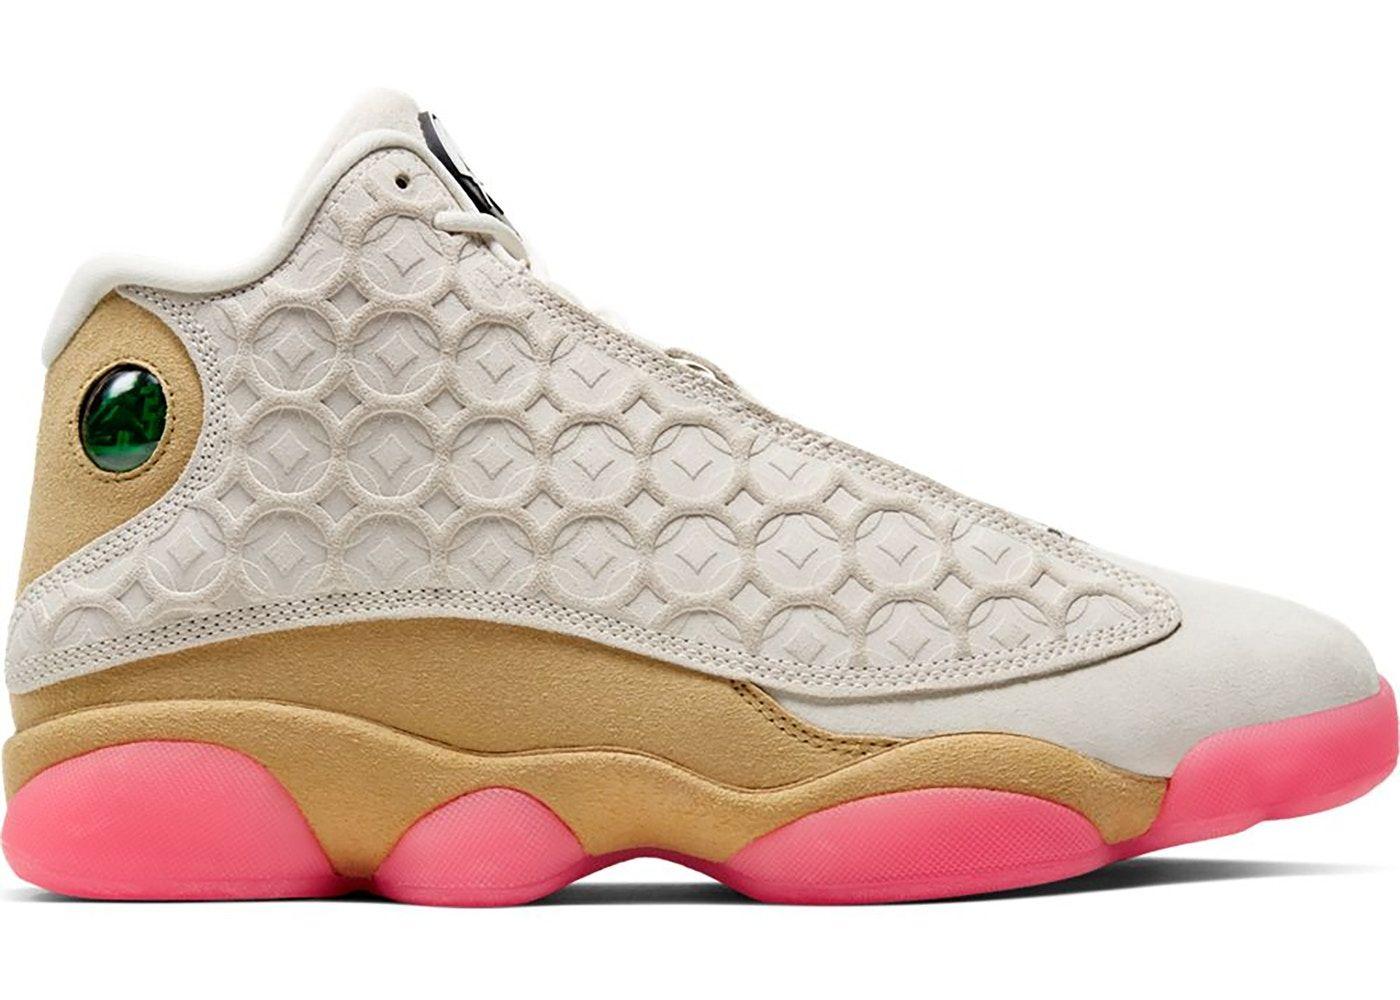 Jordan 13 Retro Chinese New Year (2020) Zapatos